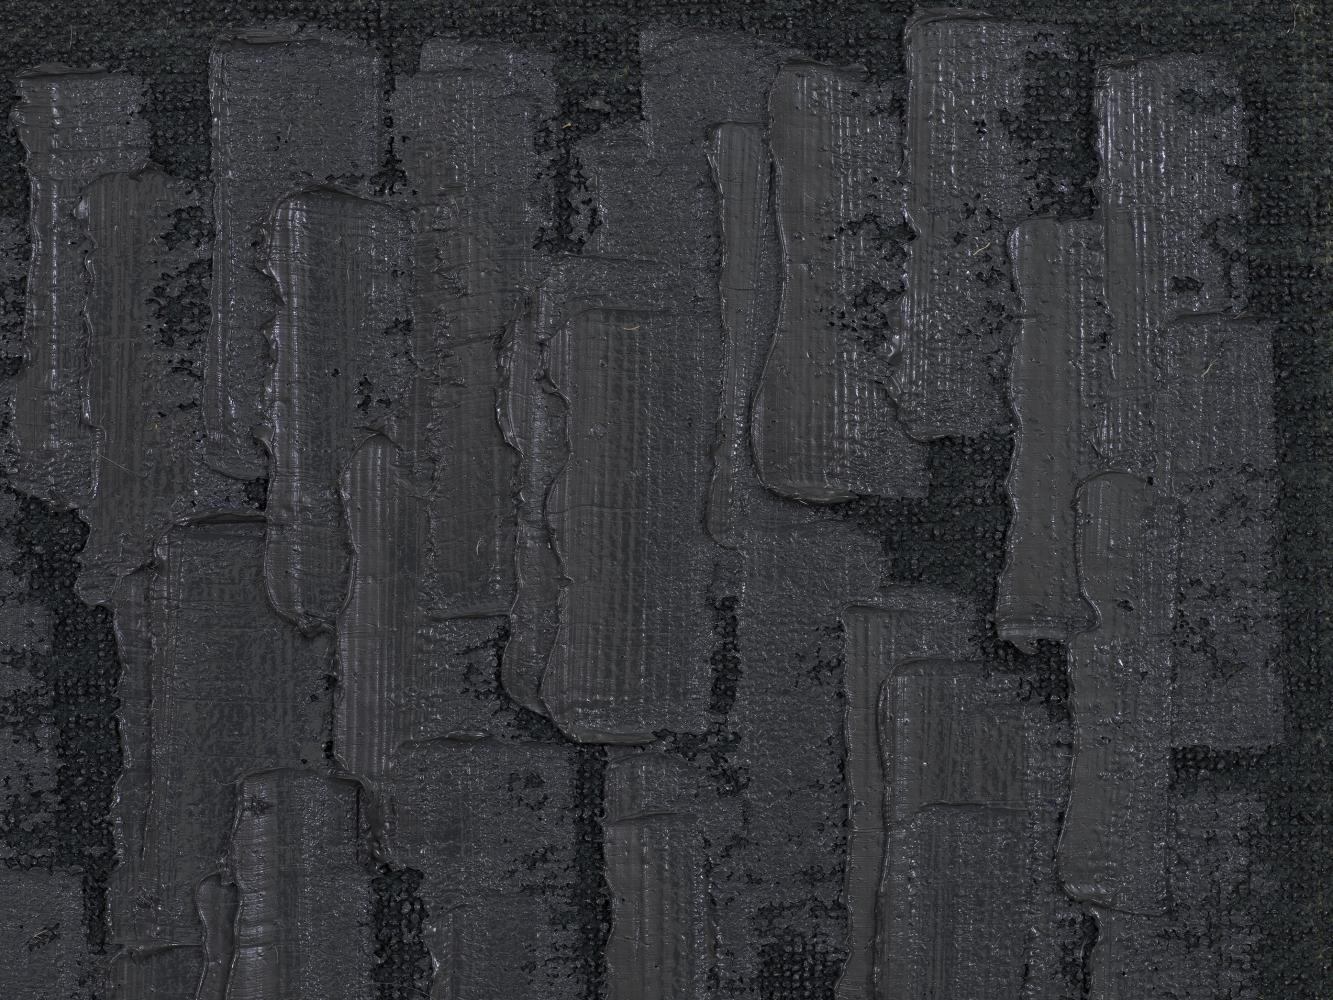 Ha Chong-Hyun (b. 1935) Conjunction 20-57, 2020 Oil on hemp cloth 46.06 x 35.83 inches 117 x 91 cm